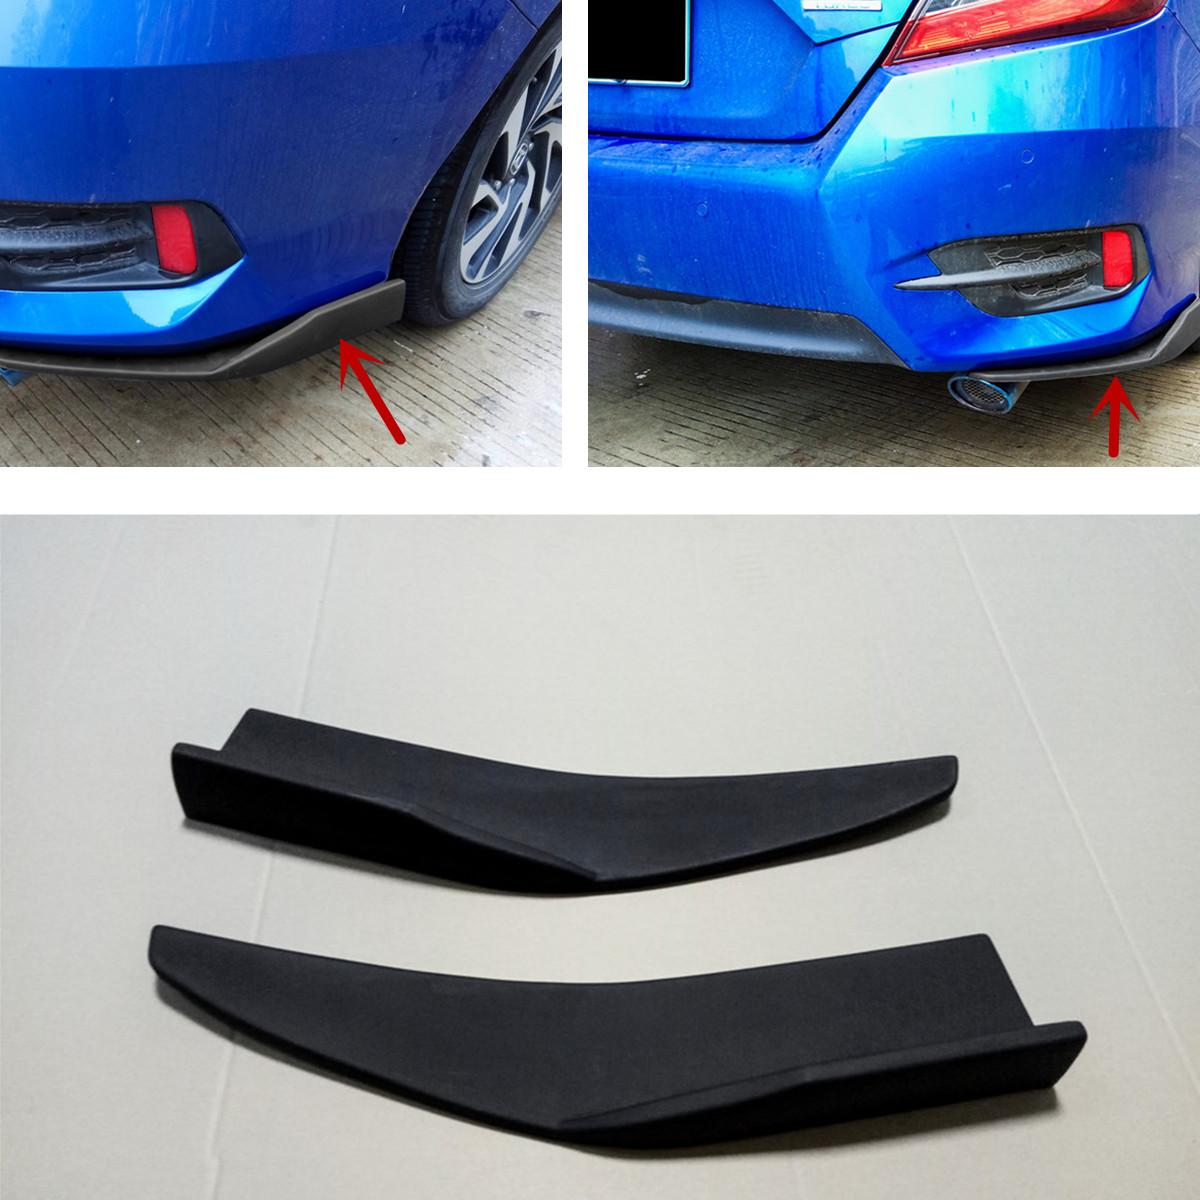 ABS NEW Auto Car Bumper Spoiler Rear lip Canard Diffuser Anti-crash Black